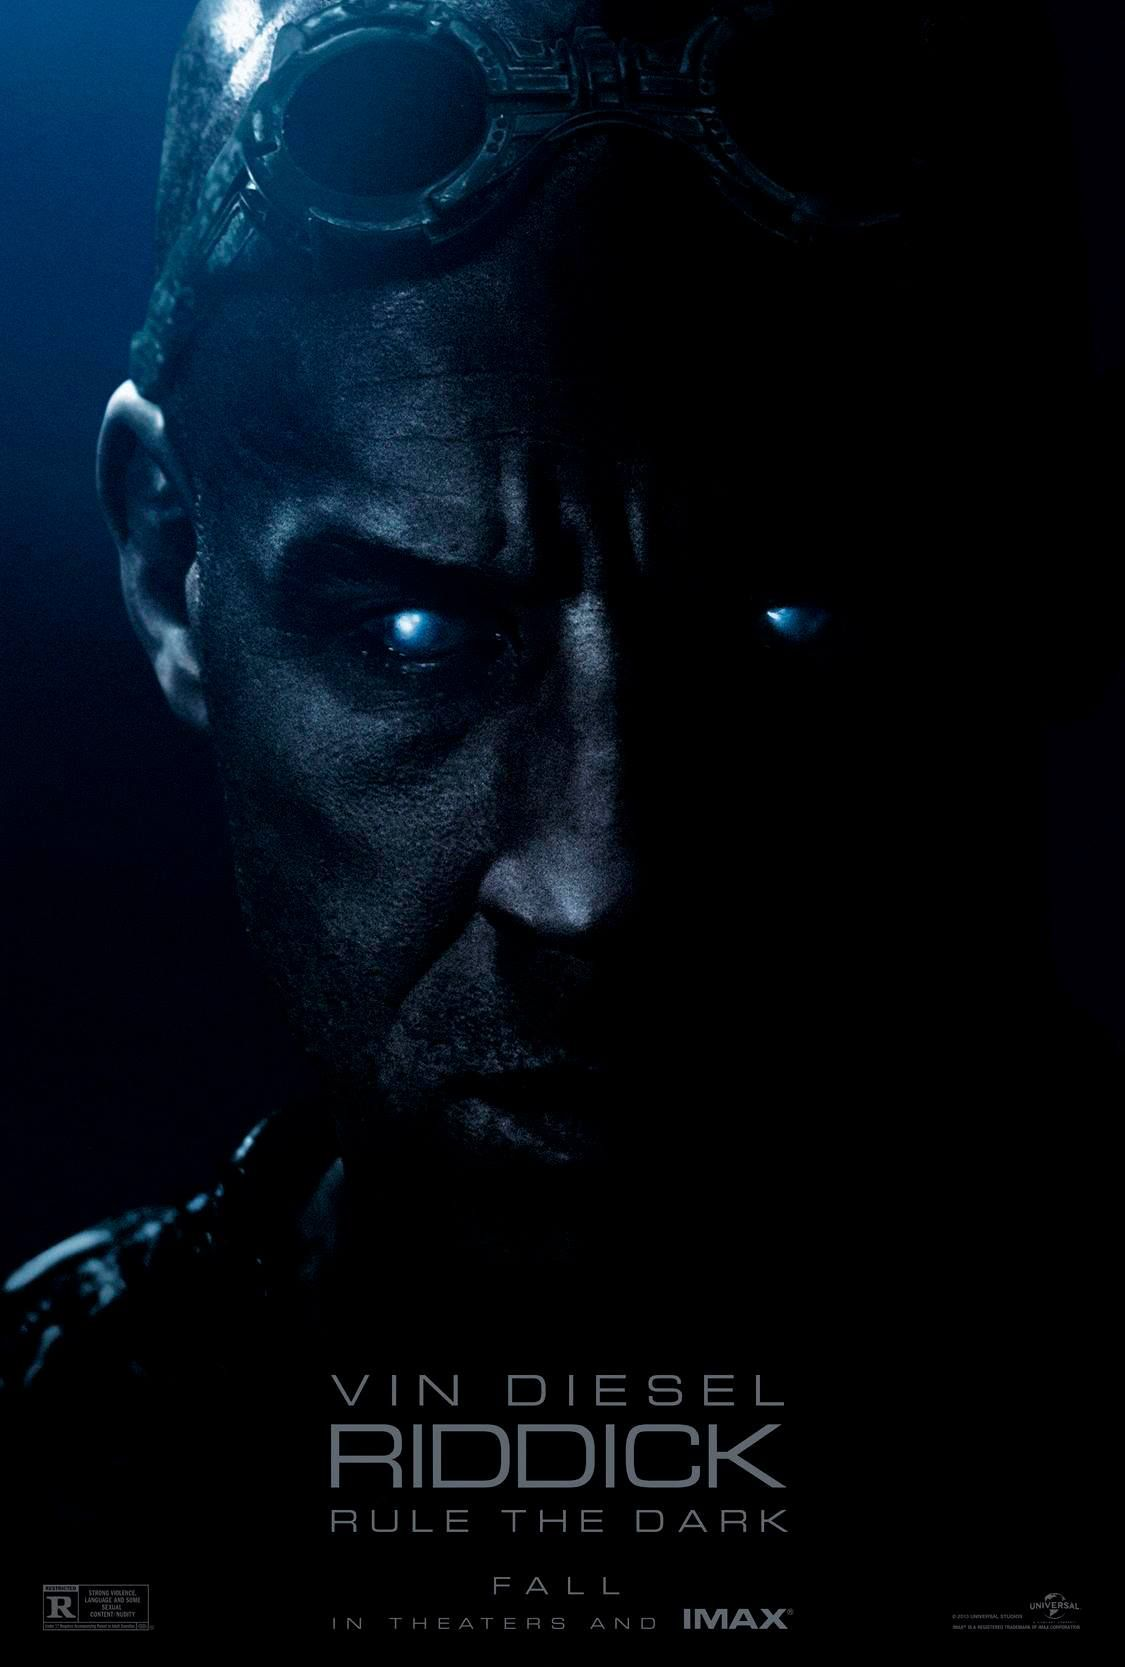 Riddick Free movies online